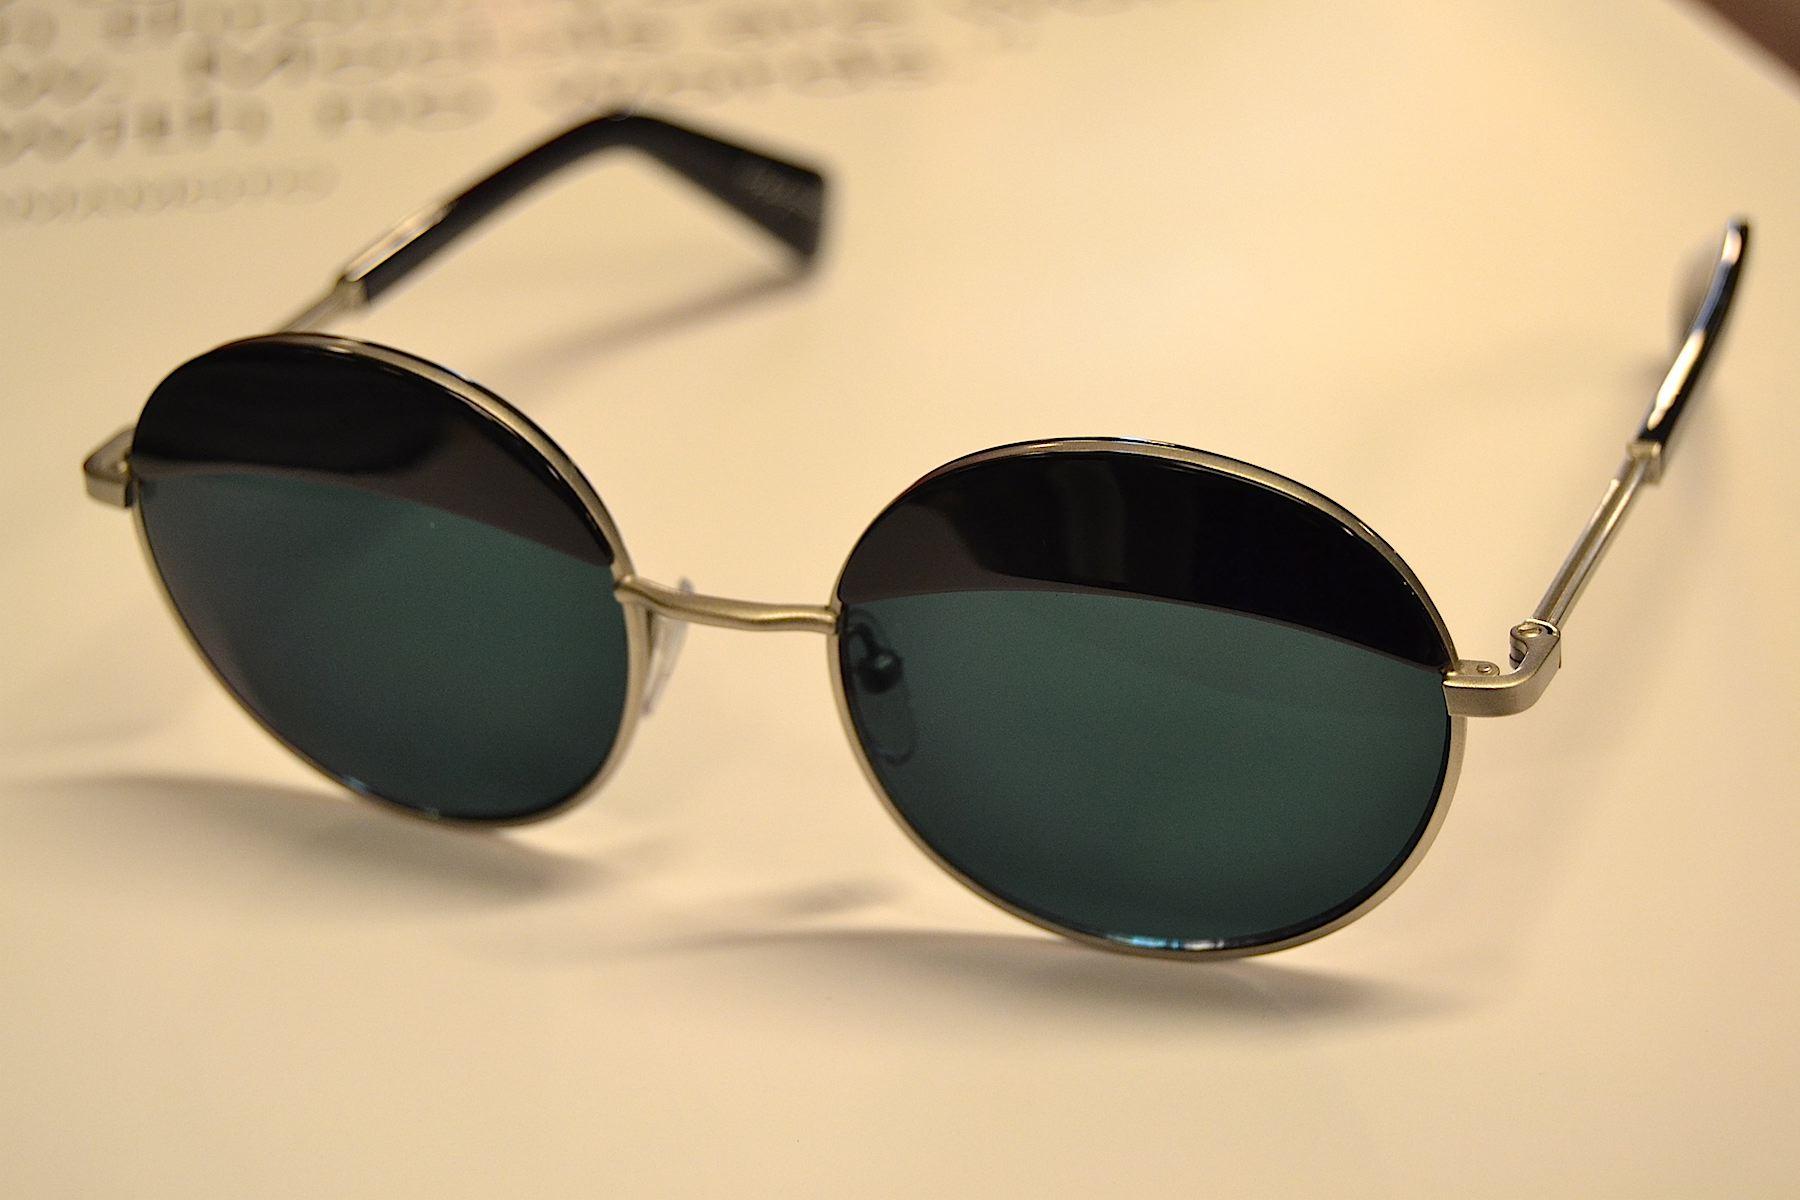 lenastore-bergamo-lenafashion-shop-online-yohji-yamamoto-gli-occhiali-sunglasses-19